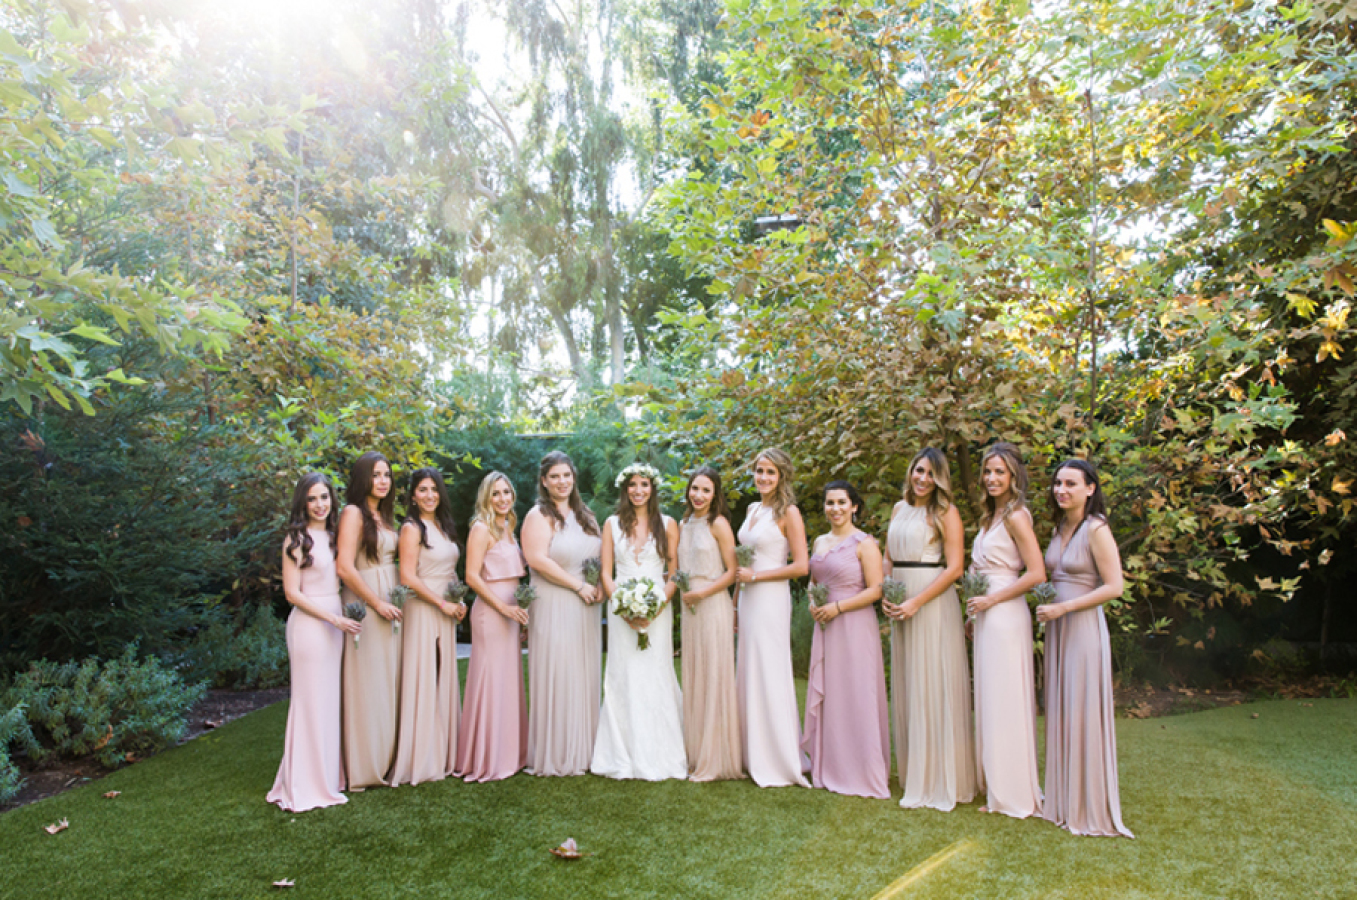 white-flowers-hidden-garden-los-angeles-wedding-heirloom-paper-invitations-the-garland-bridesmaids